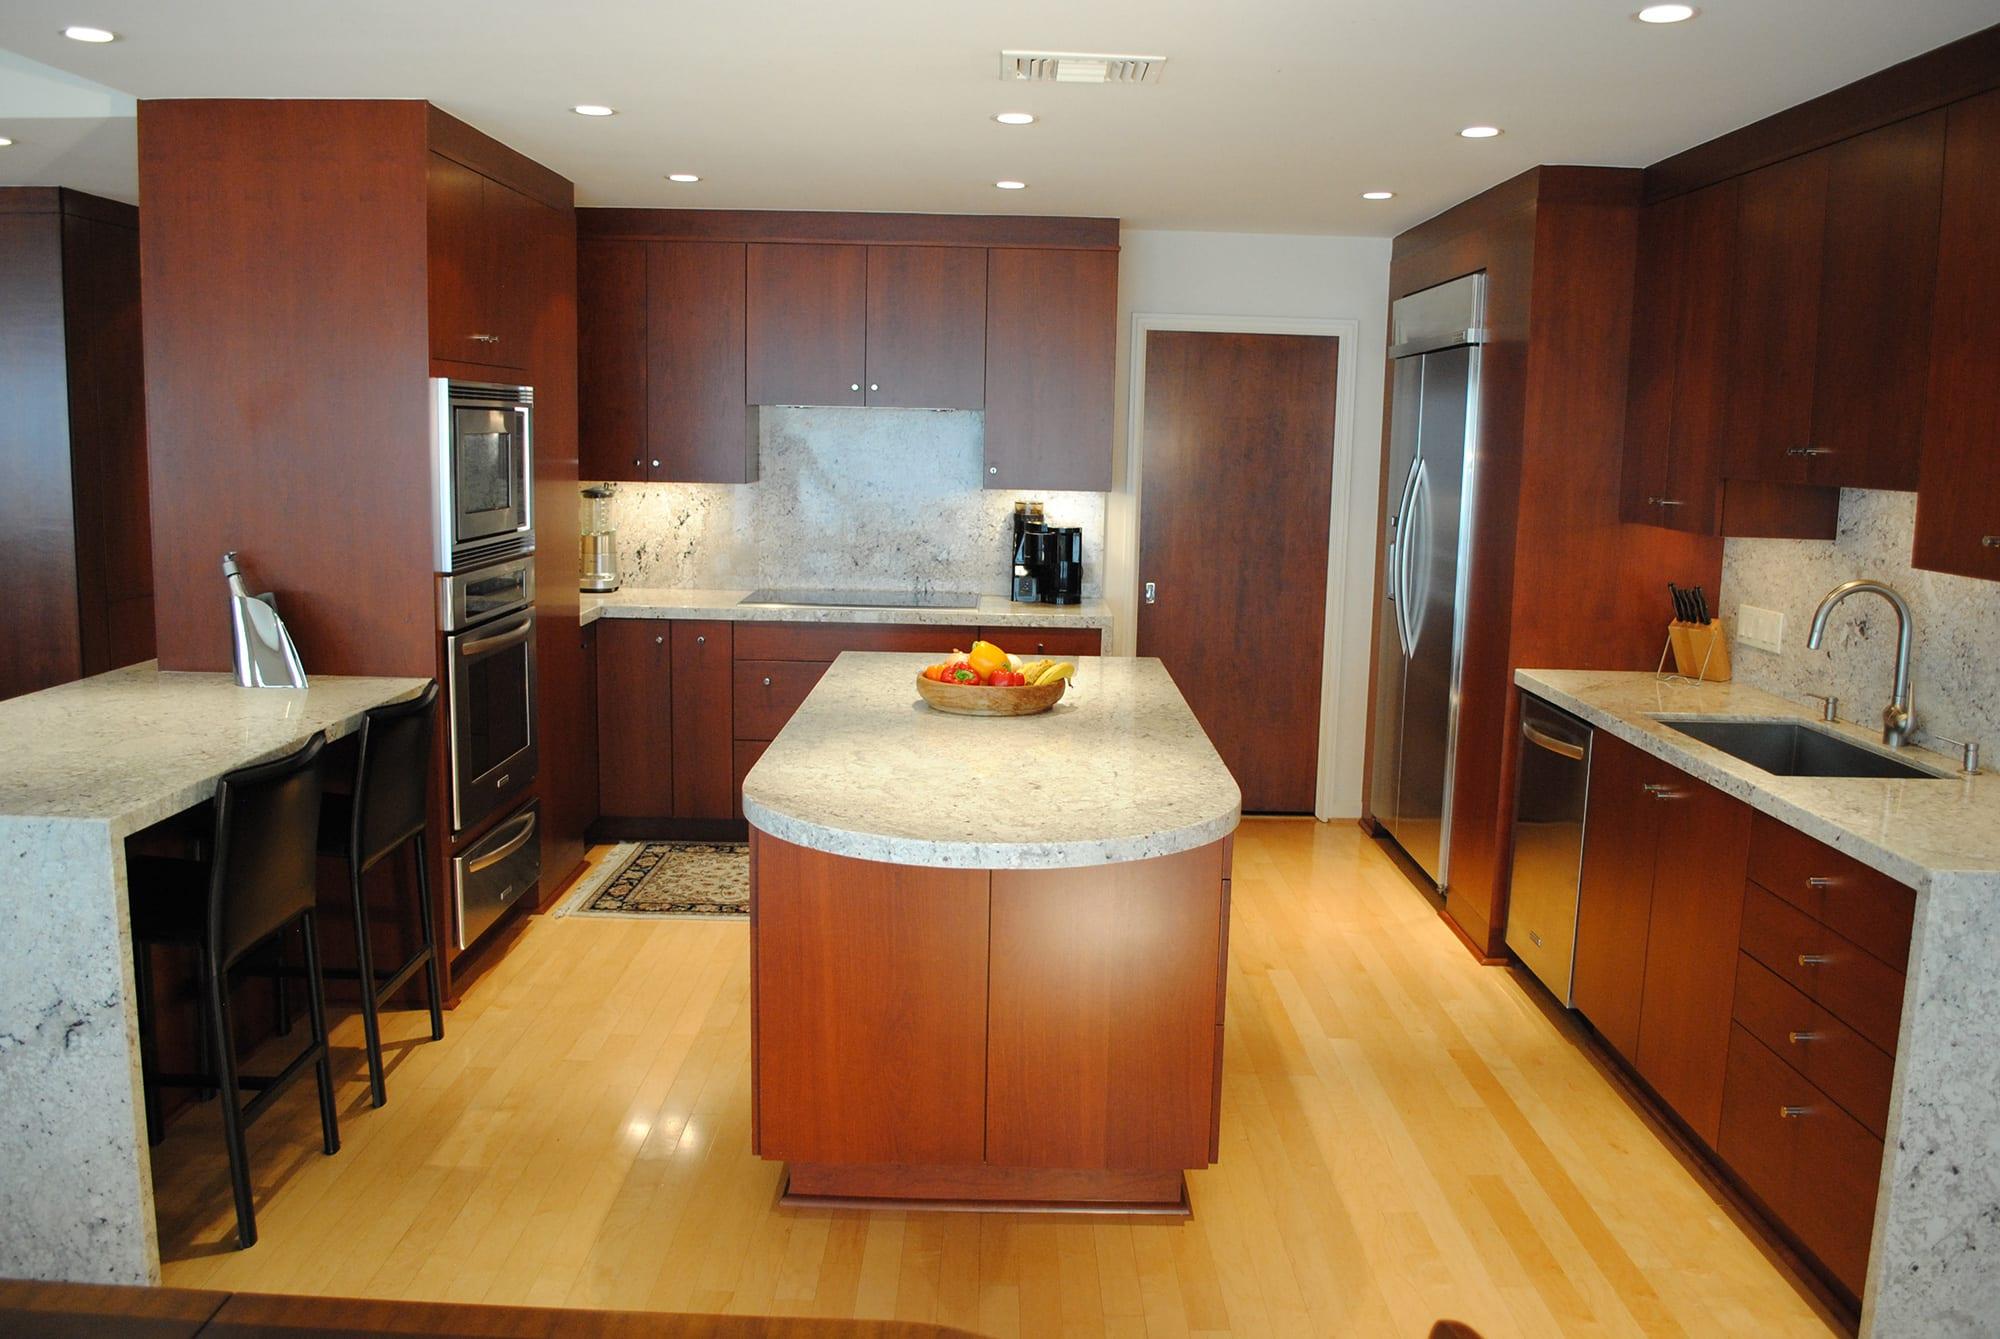 Woodmode Kitchen Cabinets Kitchen Cabinet Innovations